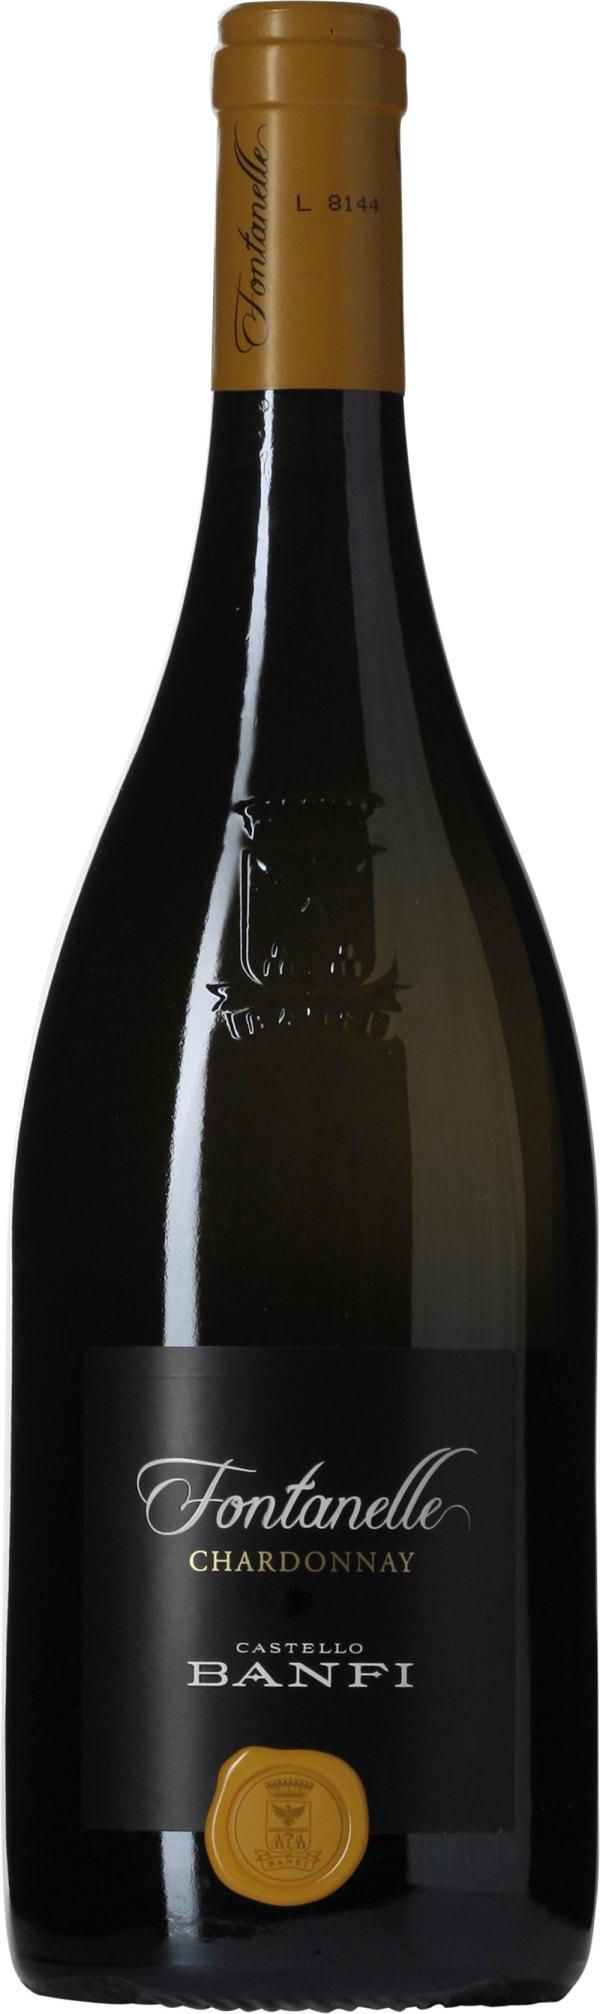 Banfi Fontanelle Chardonnay 2016